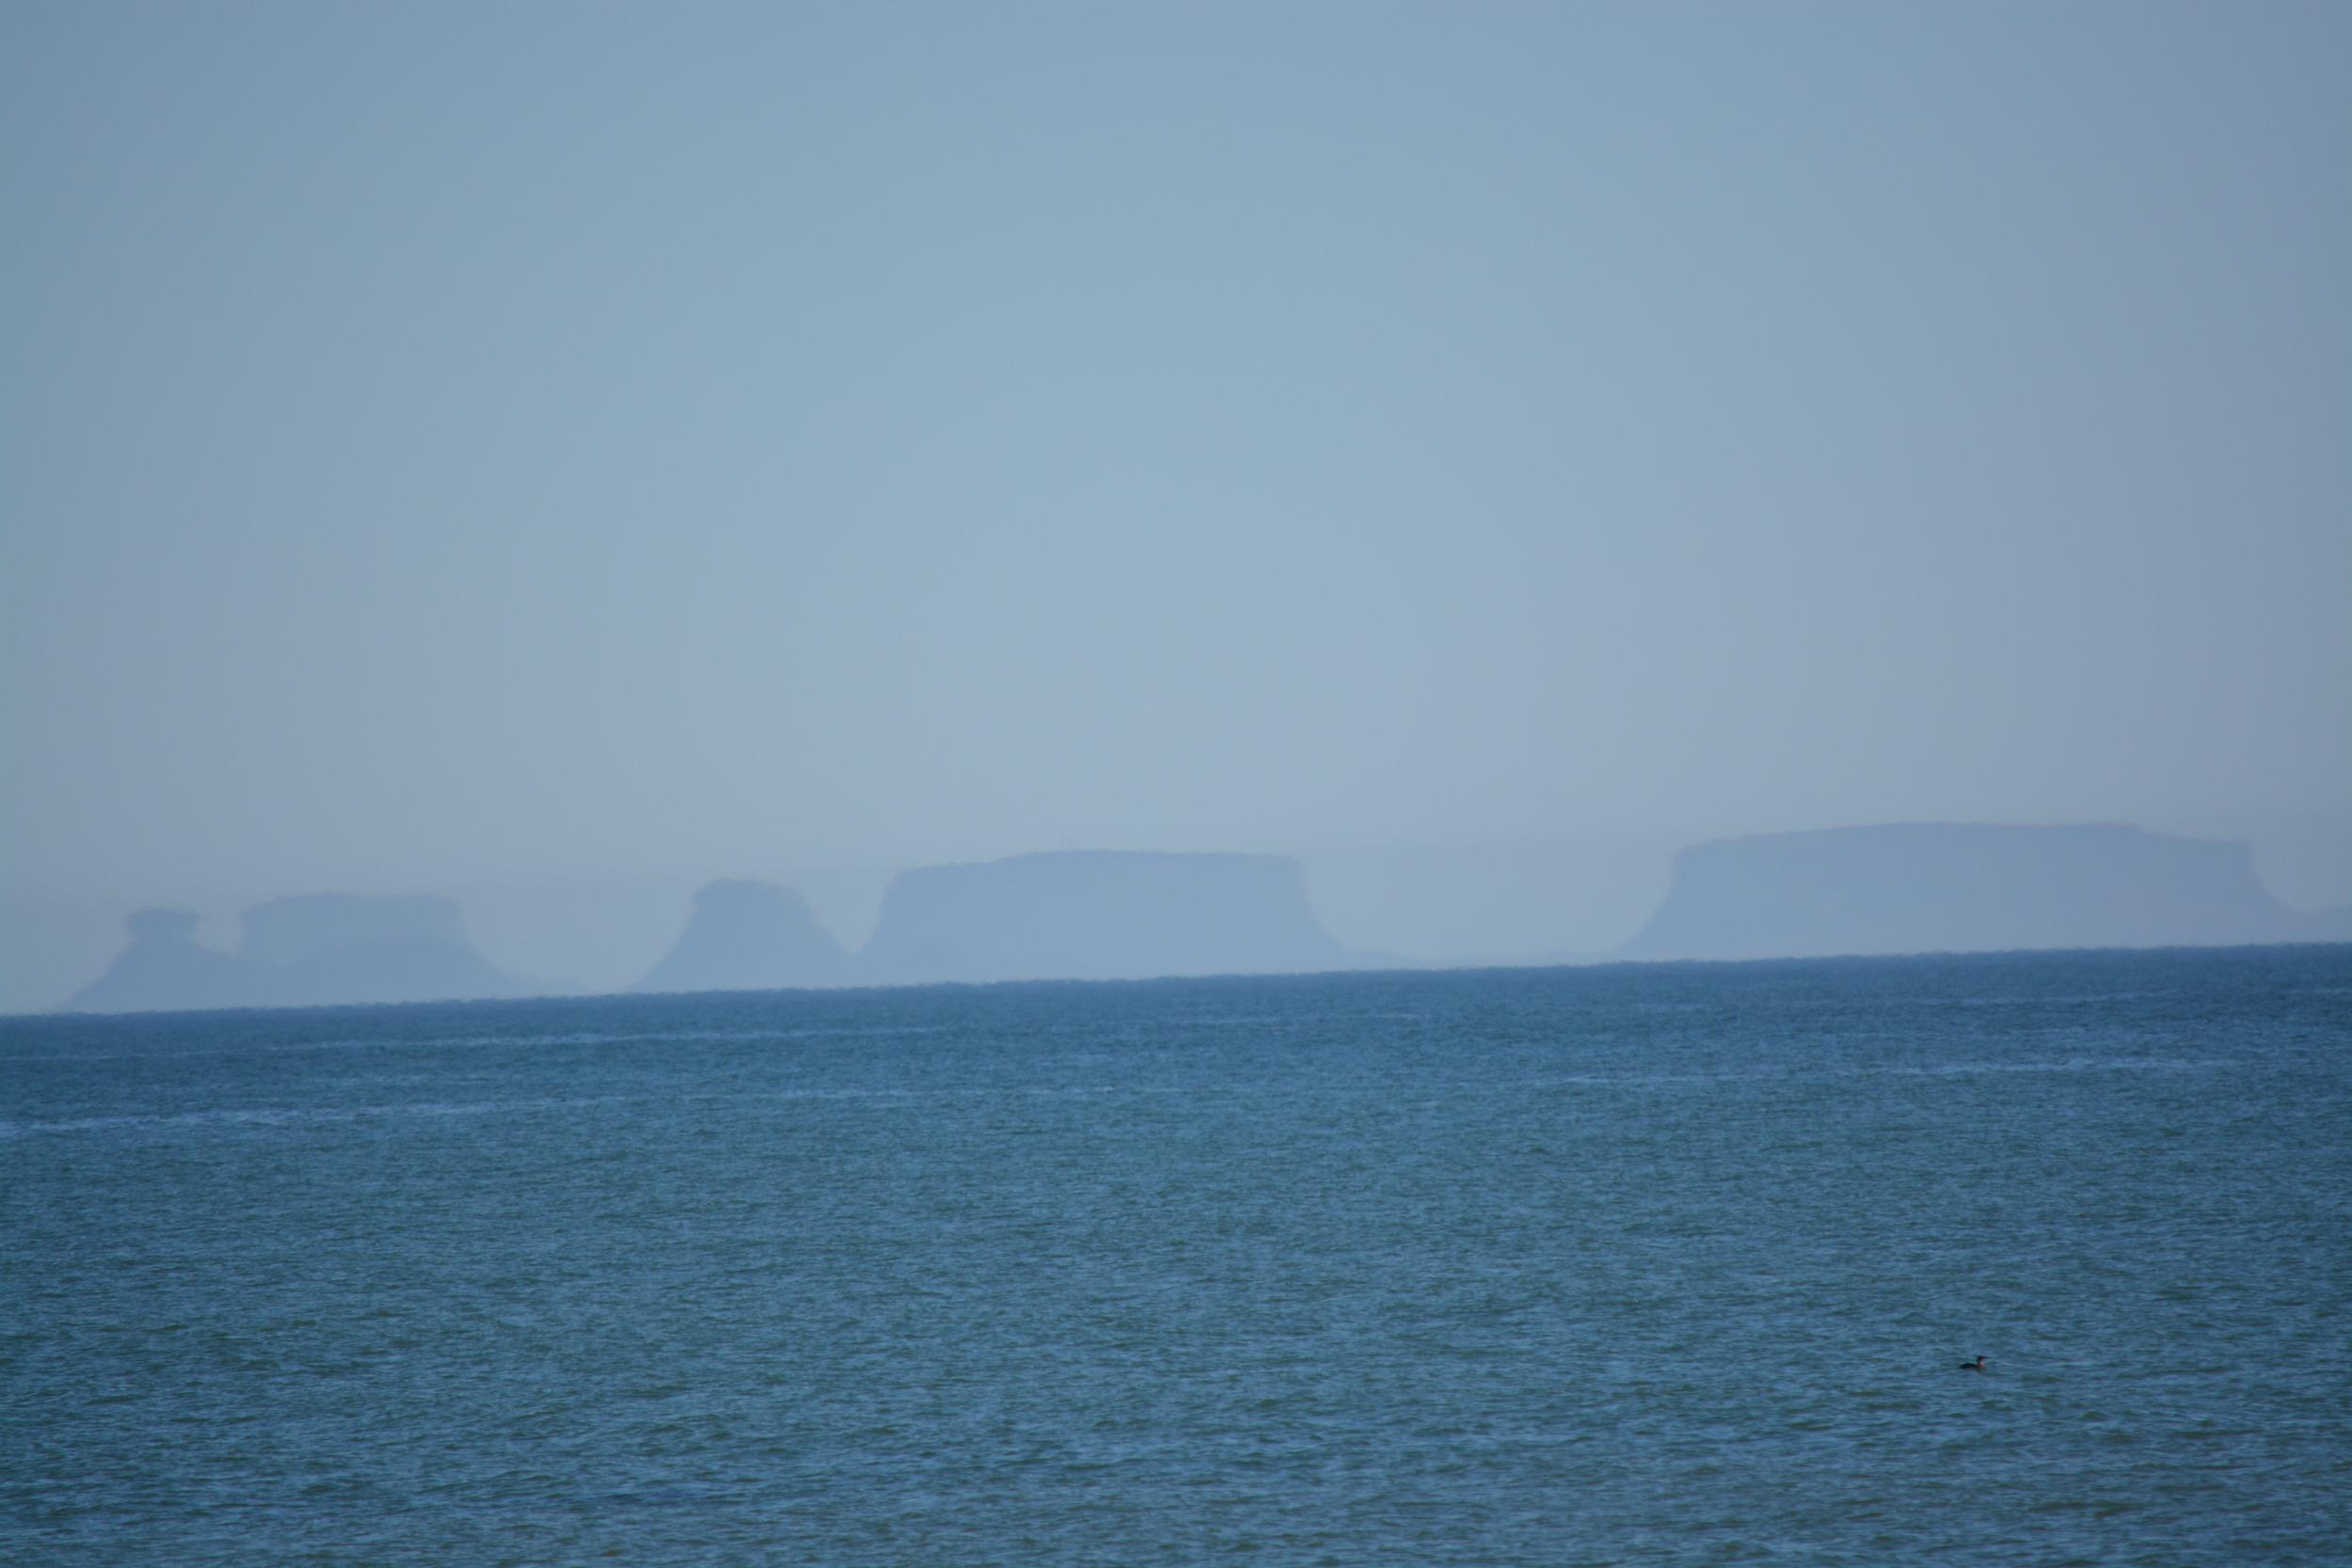 Baja California 10-5-13 Shipwrecks Surfing Adventure Ocean Experience Surf School San Diego (82).JPG